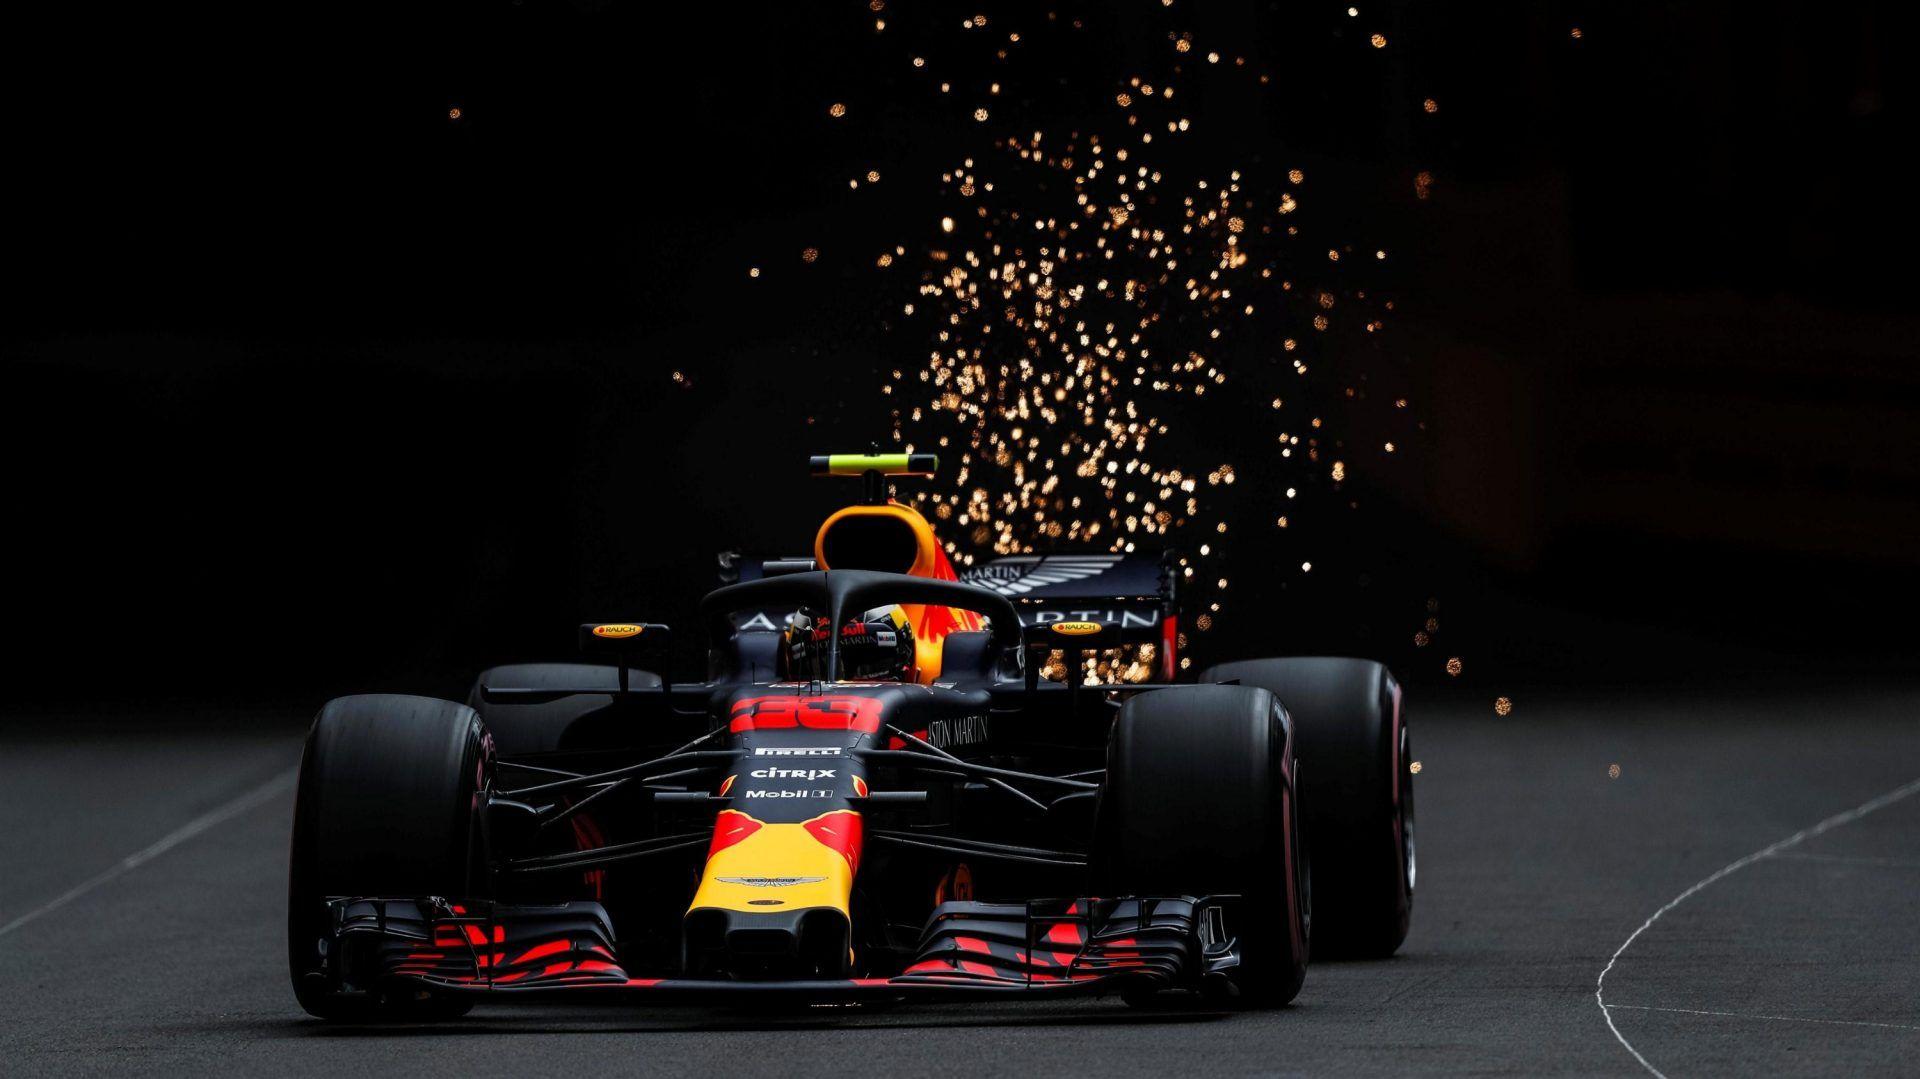 Red Bull Racing F1 2019 Ultra Hd Desktop Background: Max Verstappen Red Bull Racing RB14 Practice At Monaco